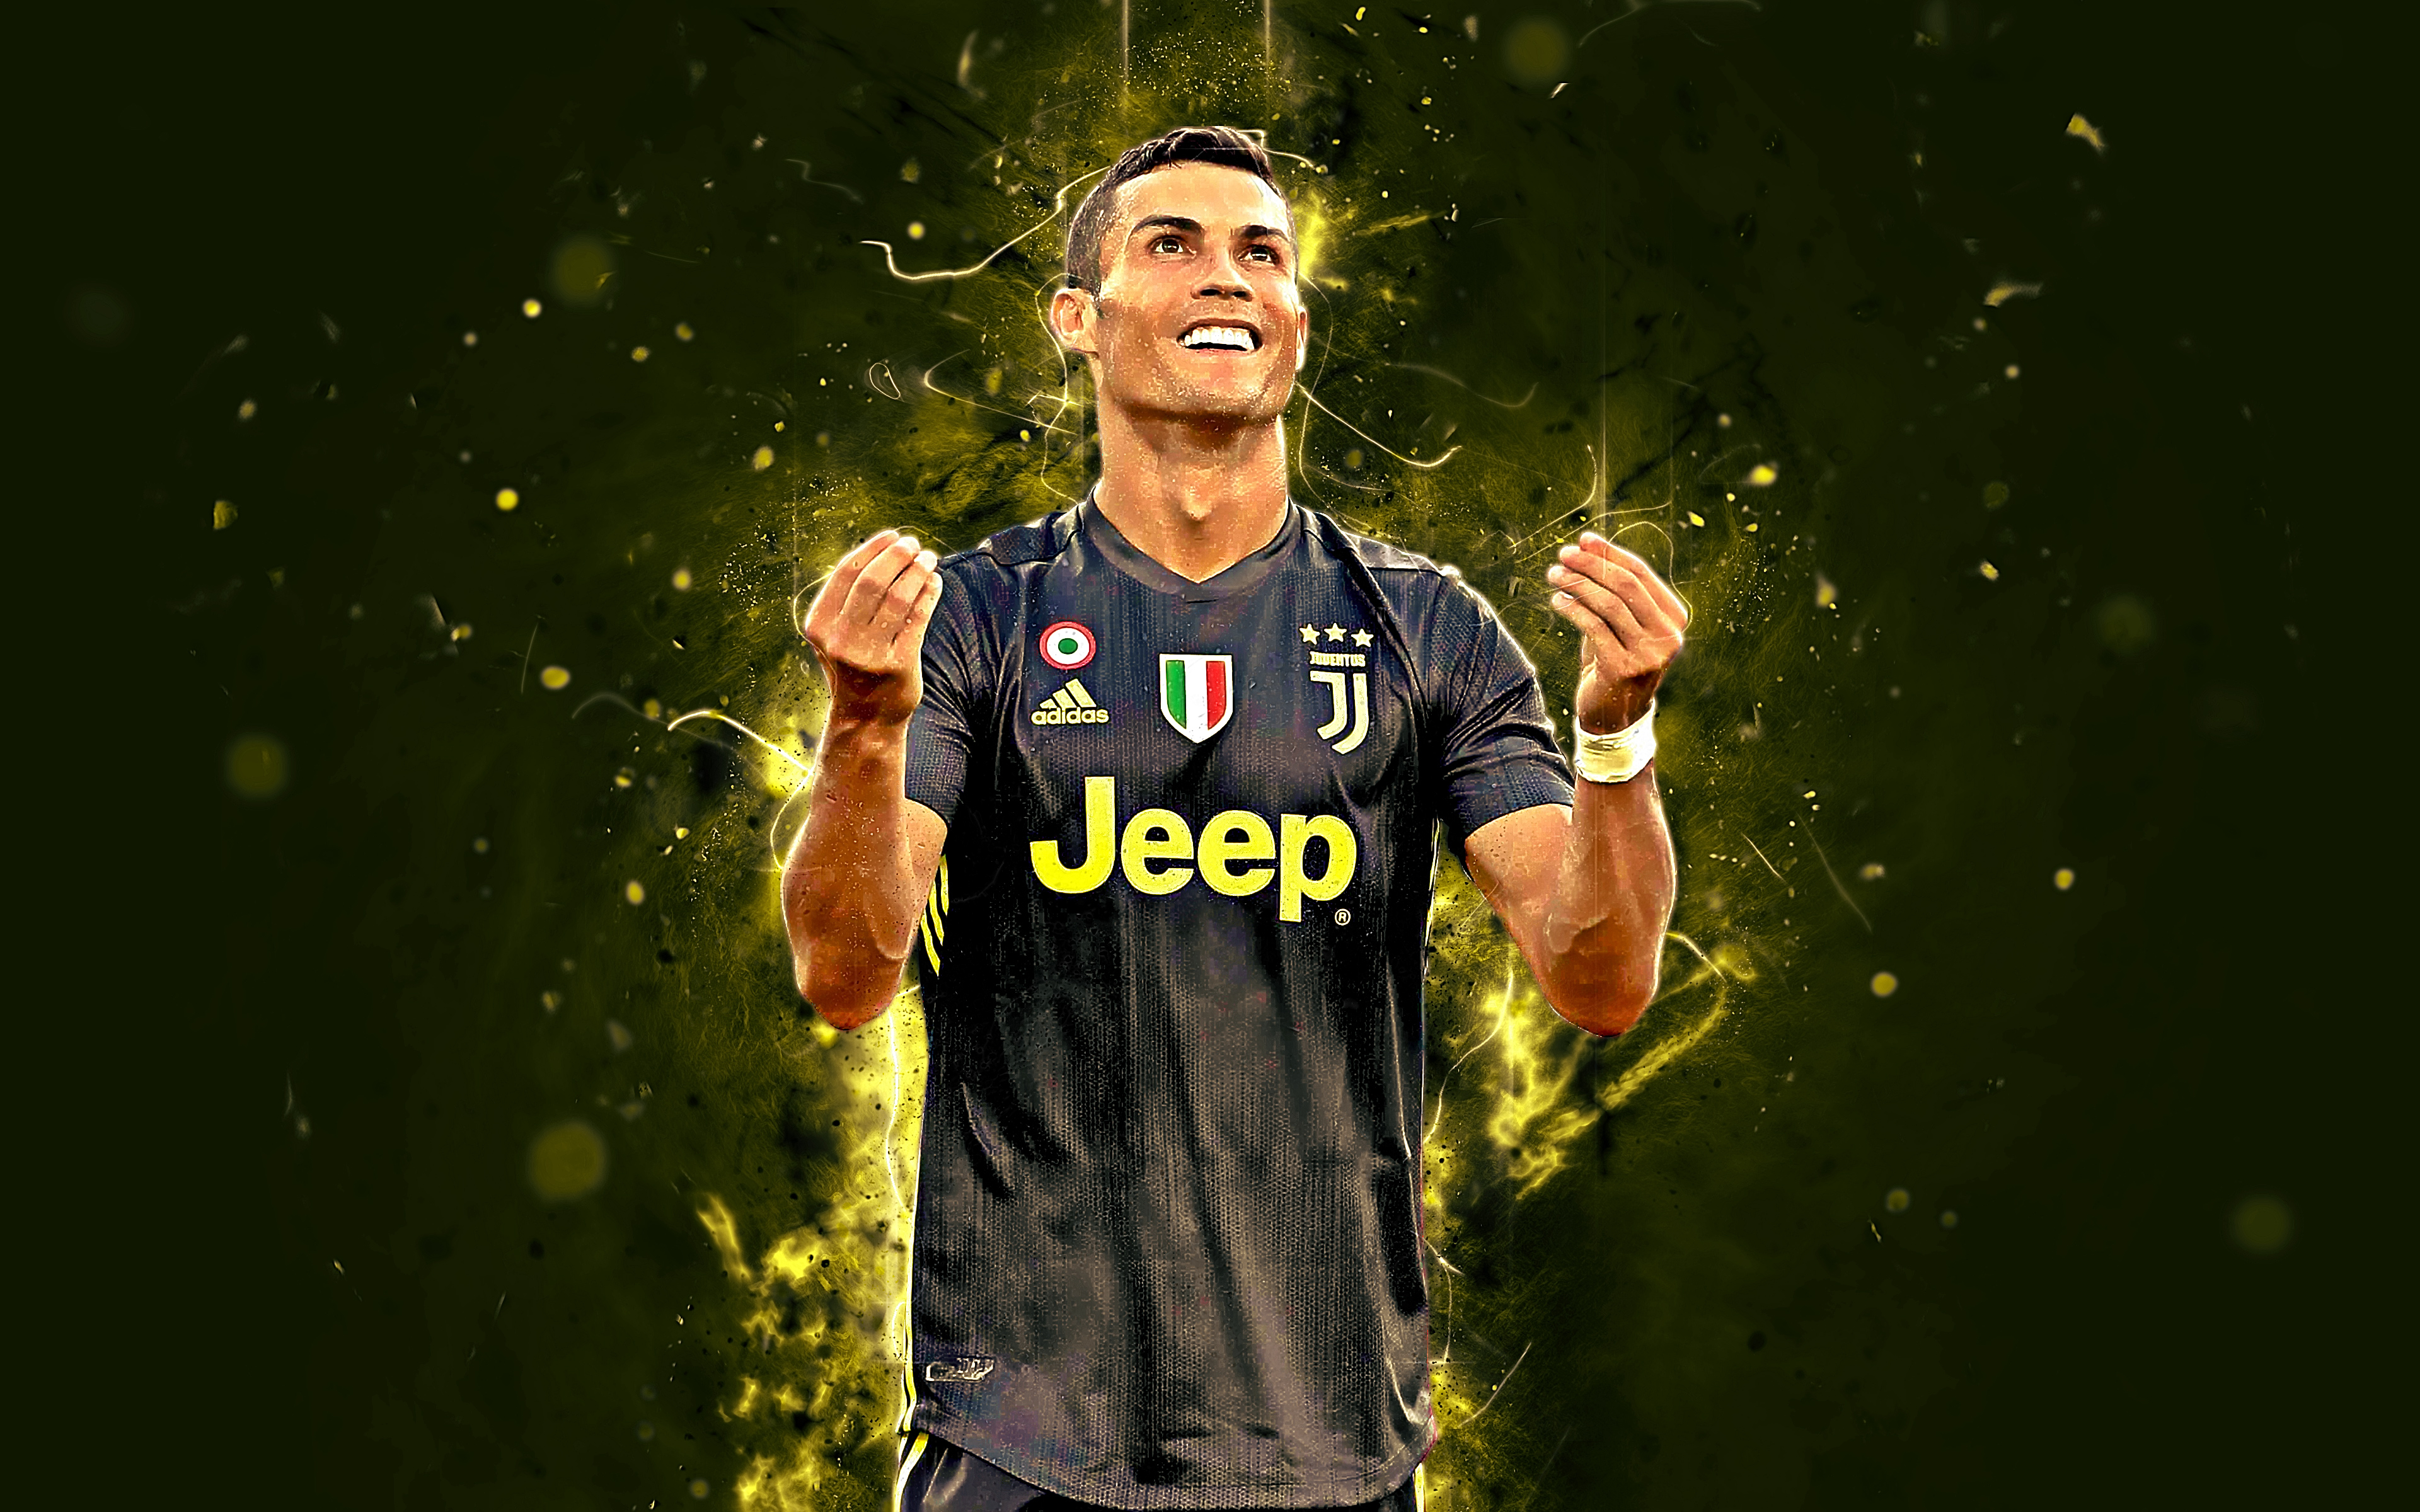 Cristiano Ronaldo Juventus 4k Ultra Hd Wallpaper Sfondi